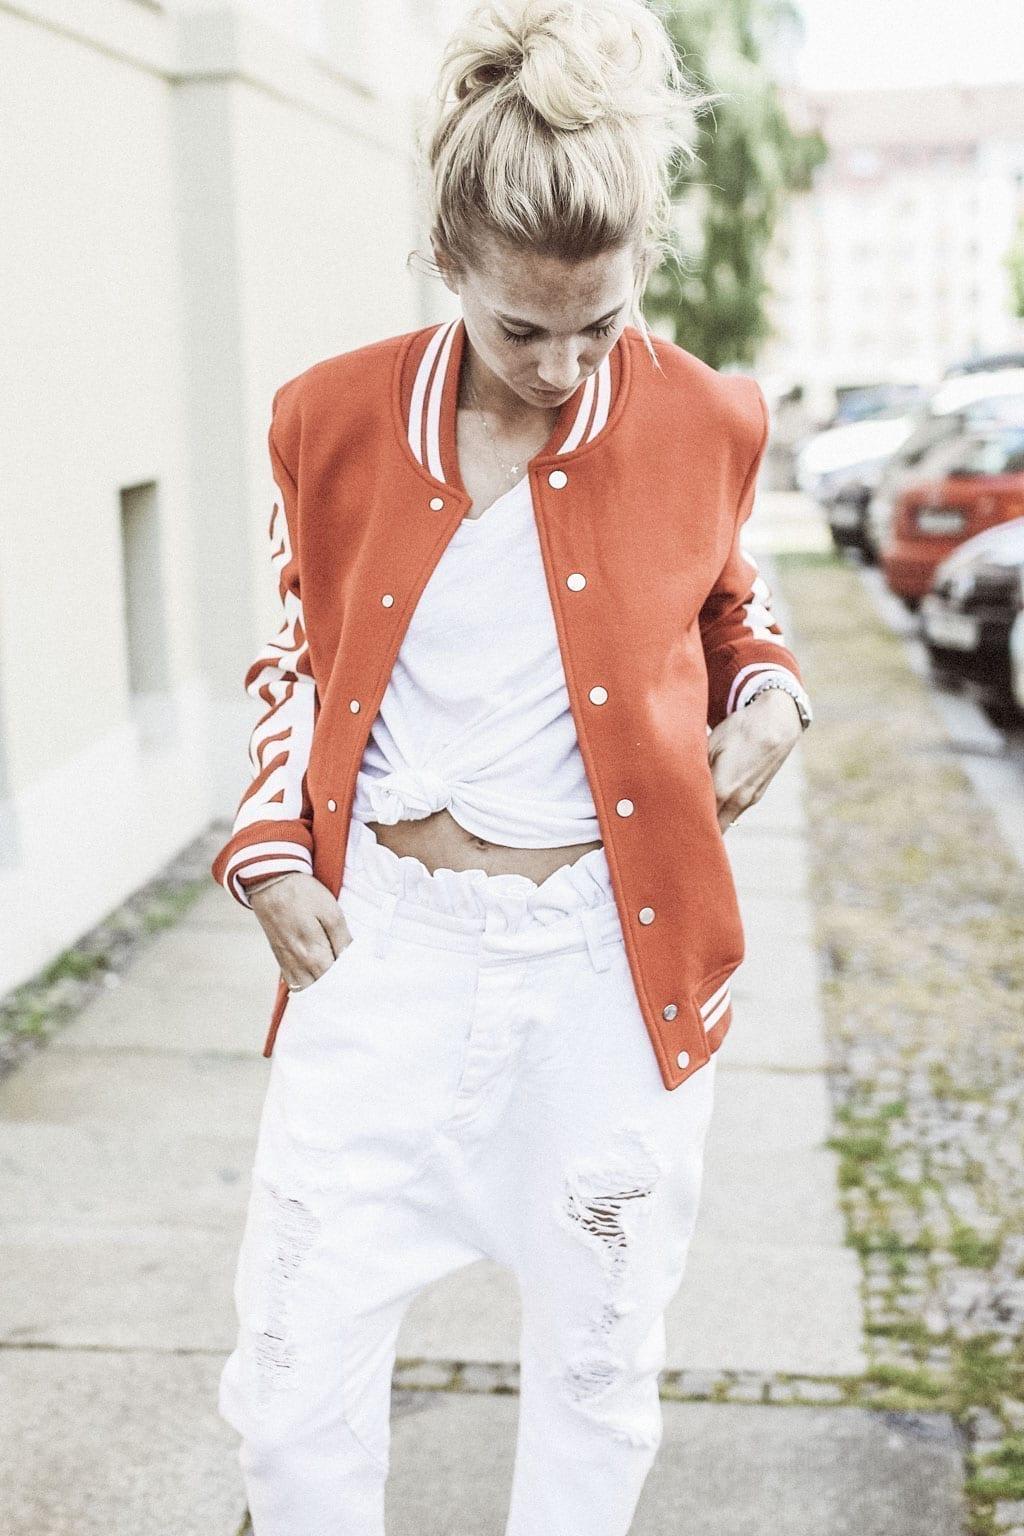 Constantly-K-karin-kaswurm-white-red-rieger-jacket-salzburg-fashion-street-style-8389